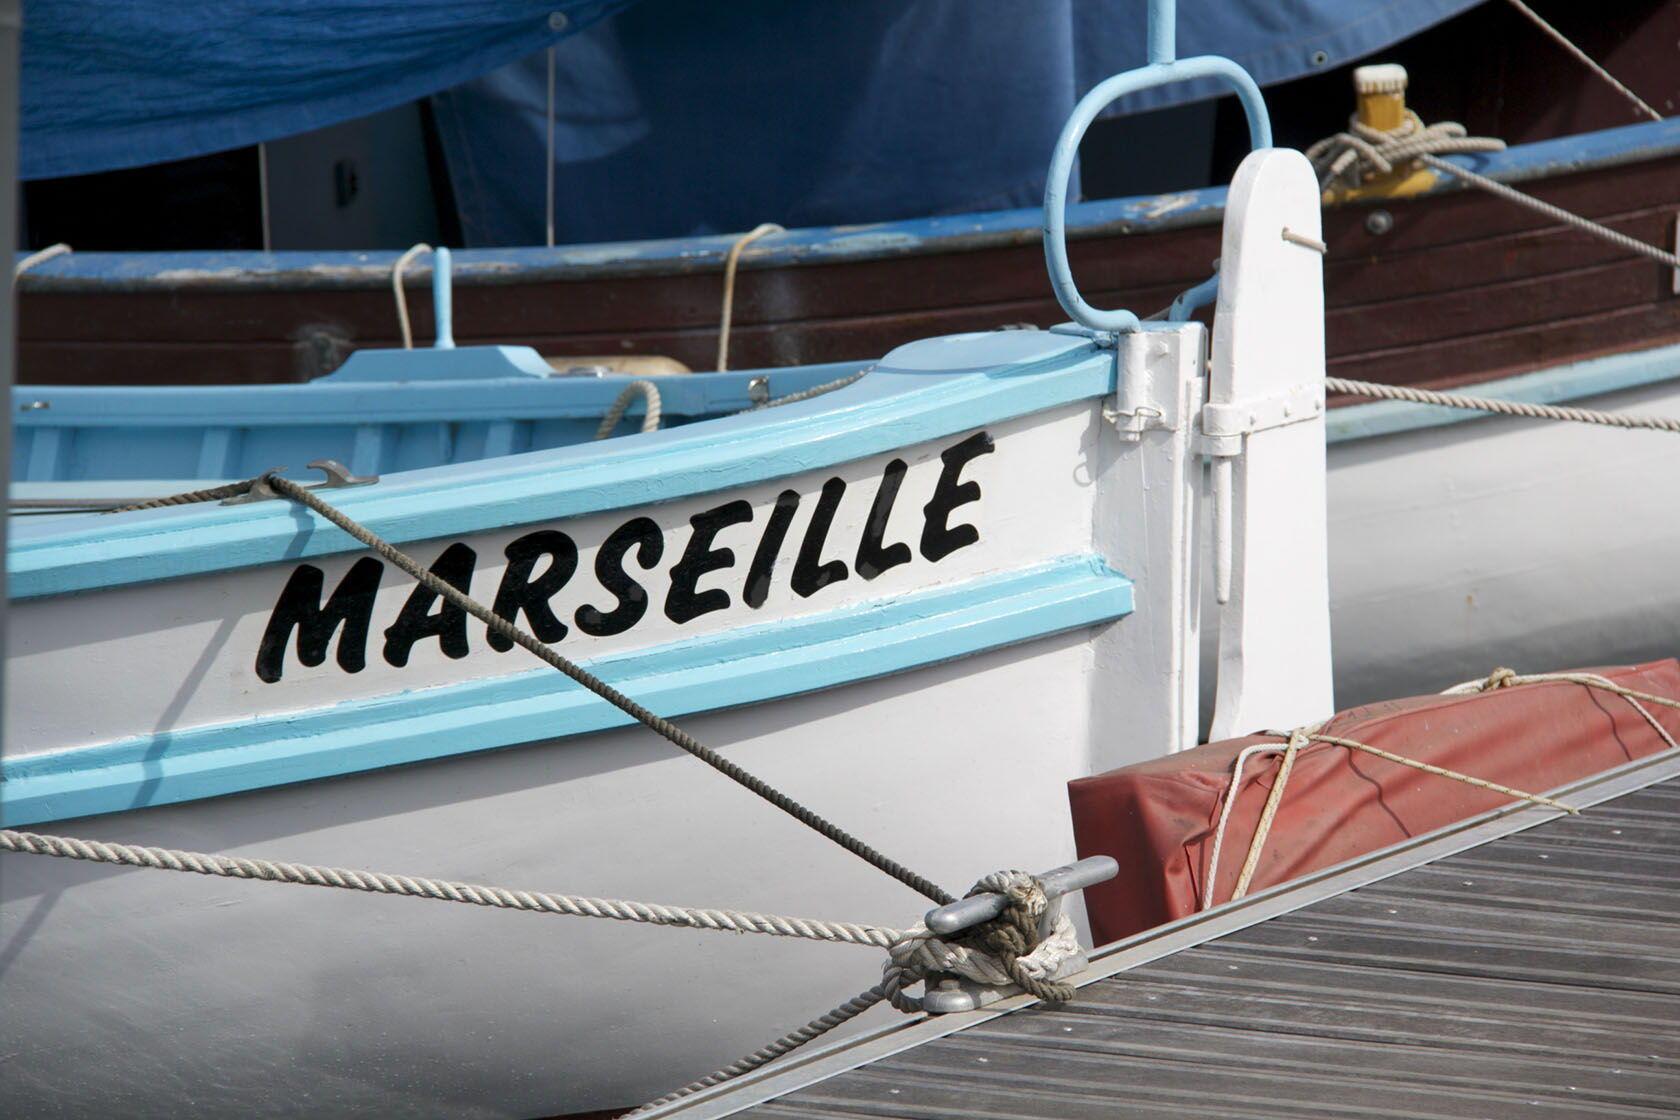 Marseille boats Marseille